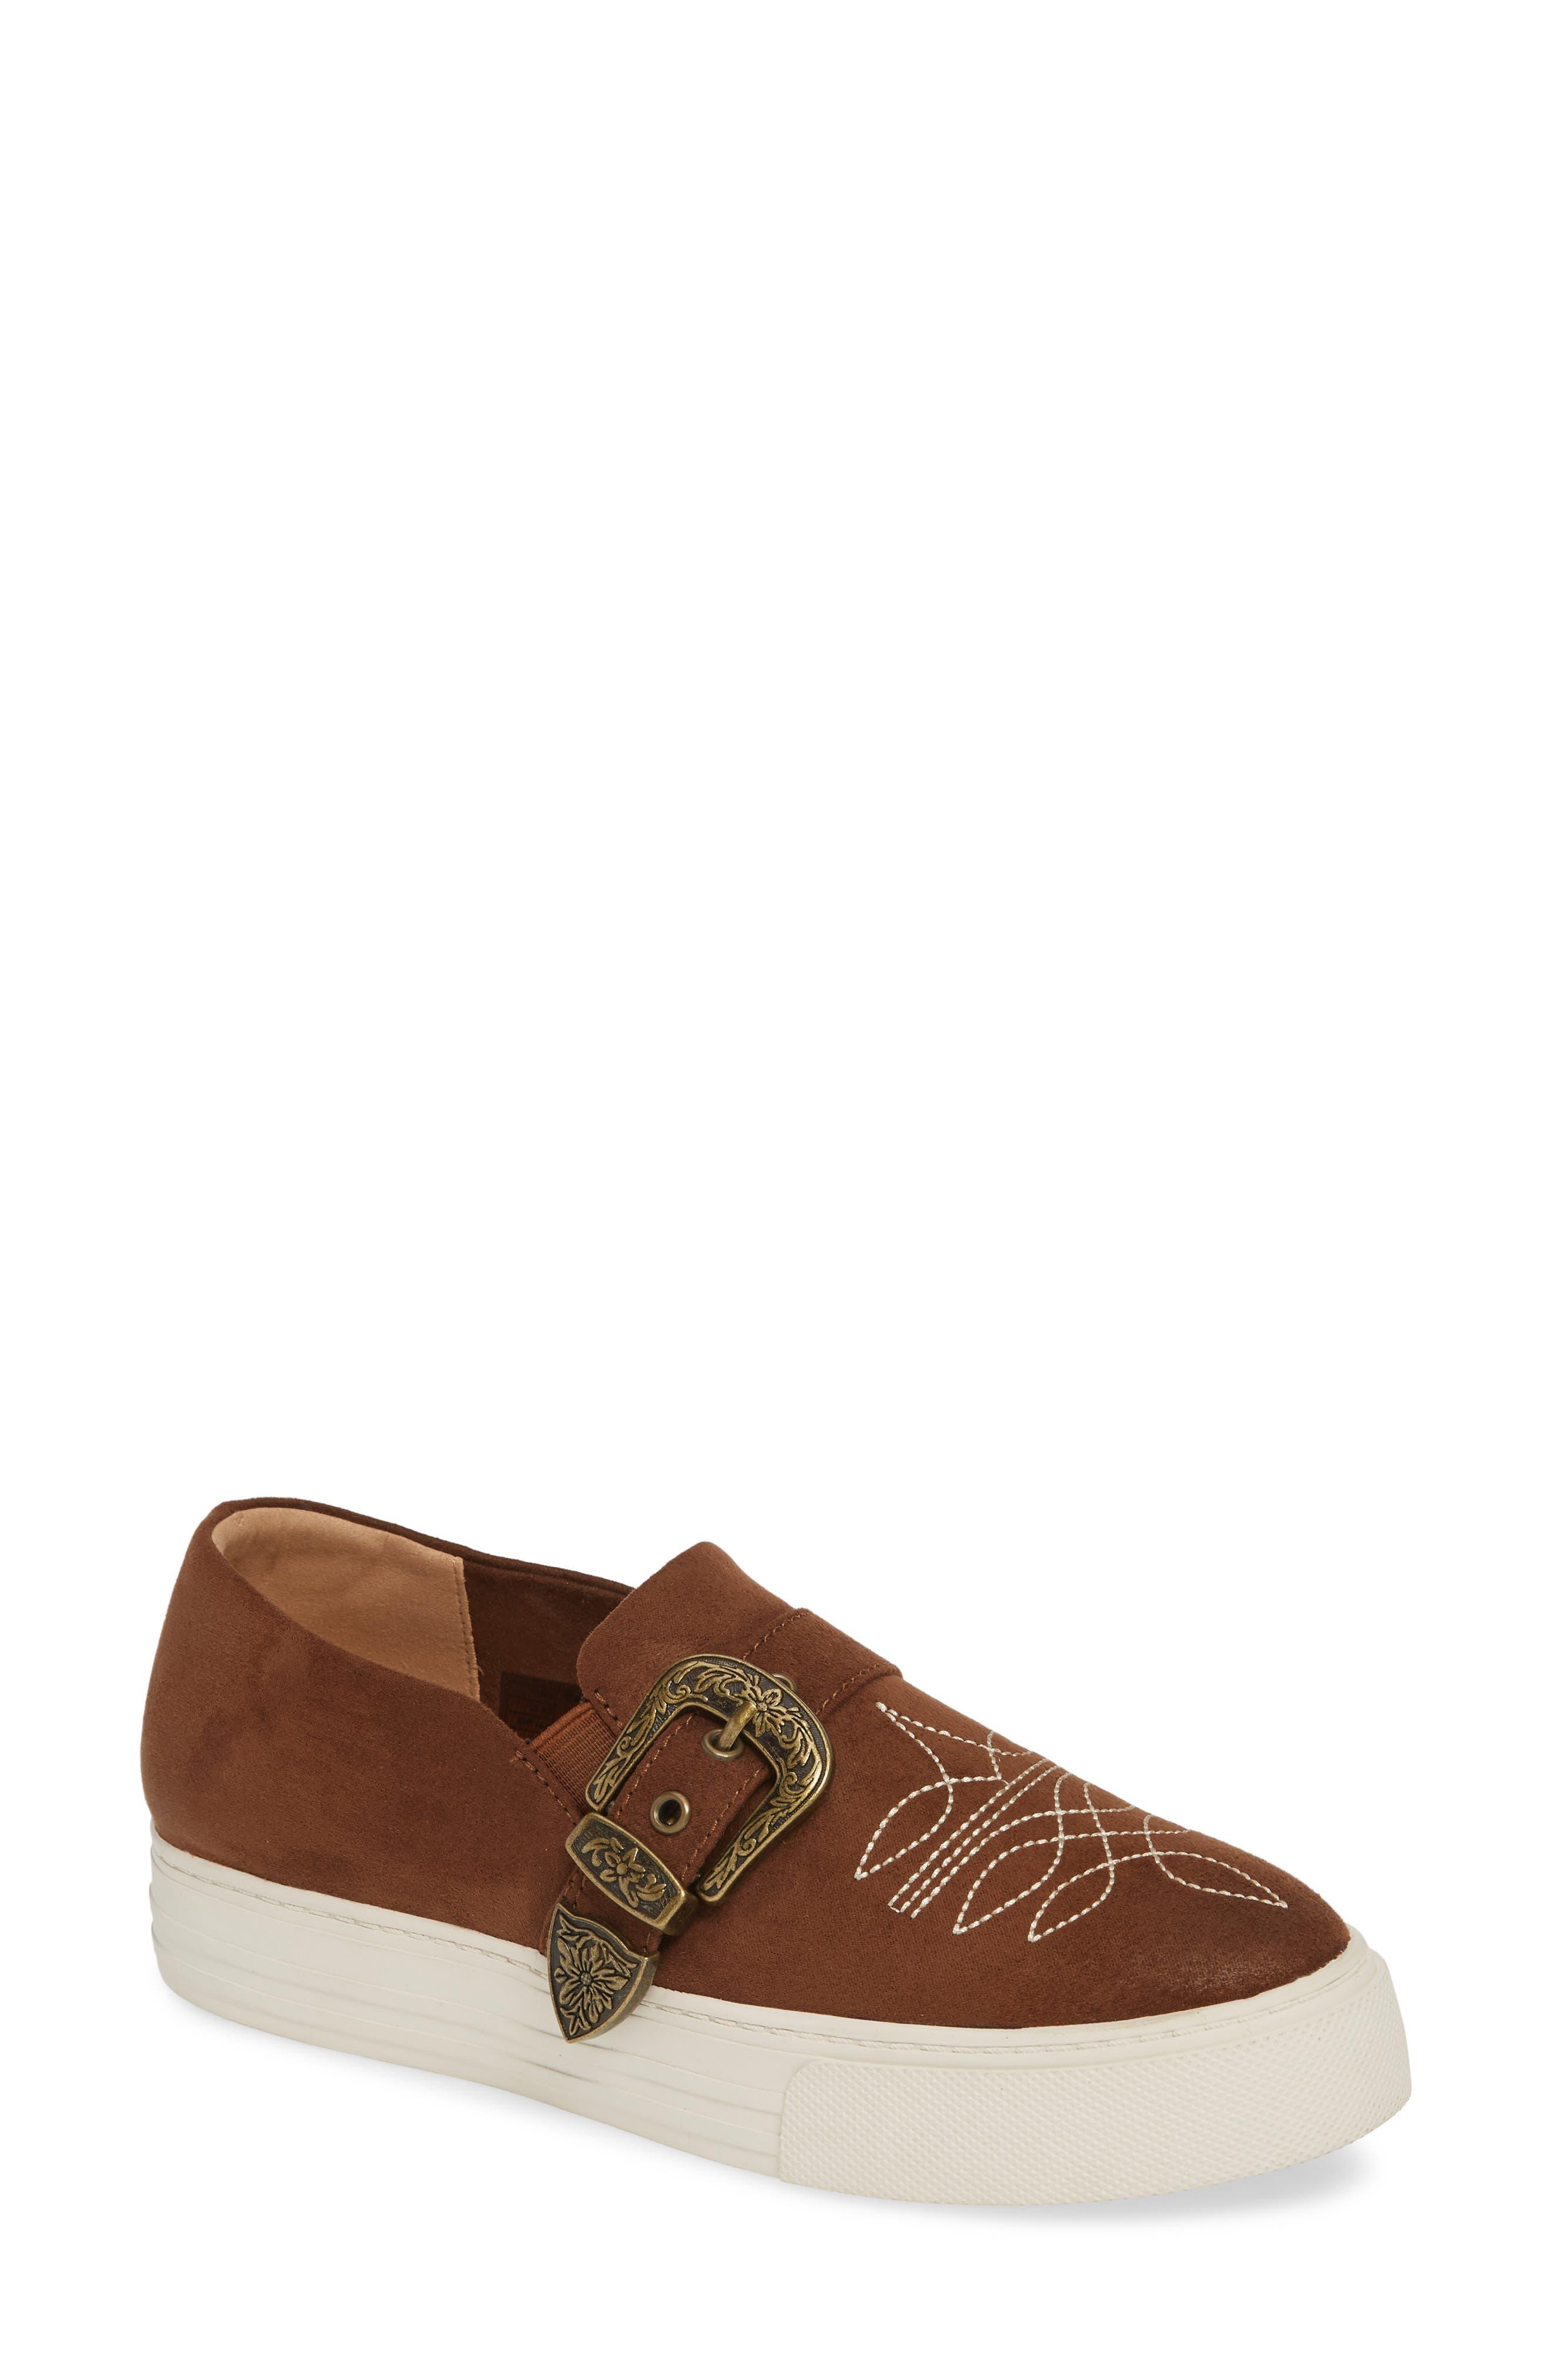 Ariat Willow Platform Sneaker, Brown